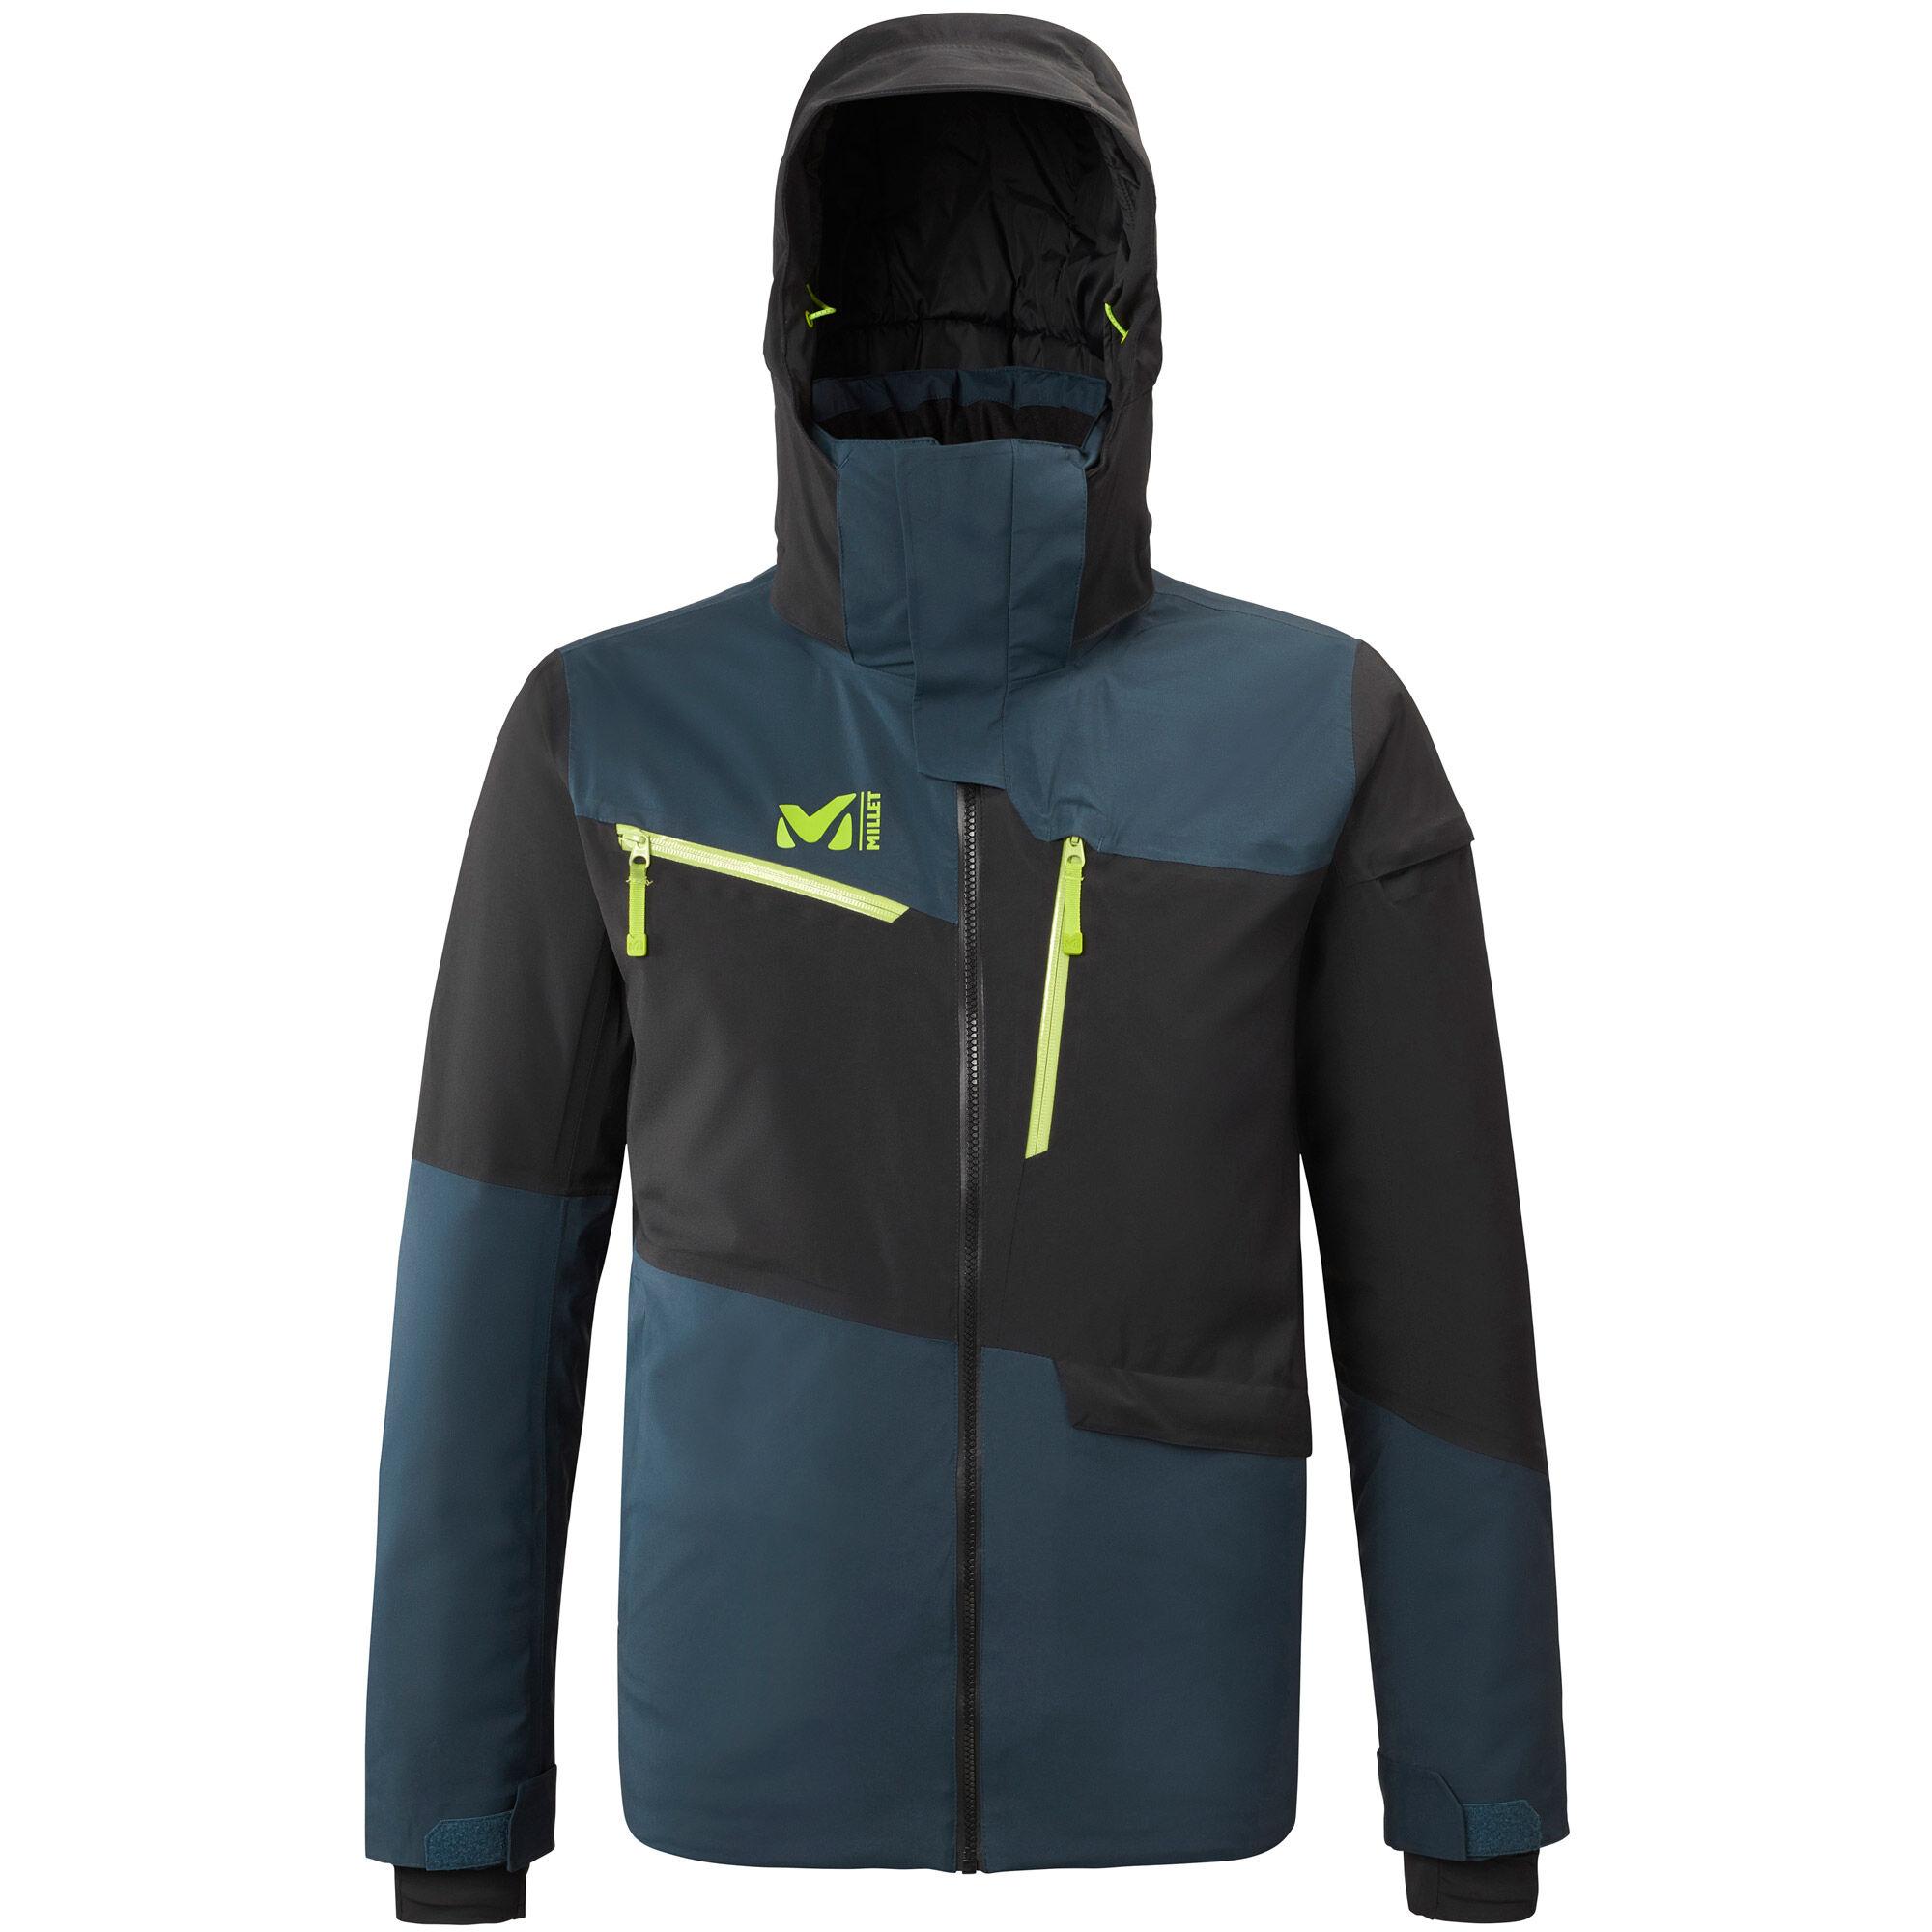 MILLET Veste de Ski Anton GTX Stretch Jacket - Orion Blue Noir